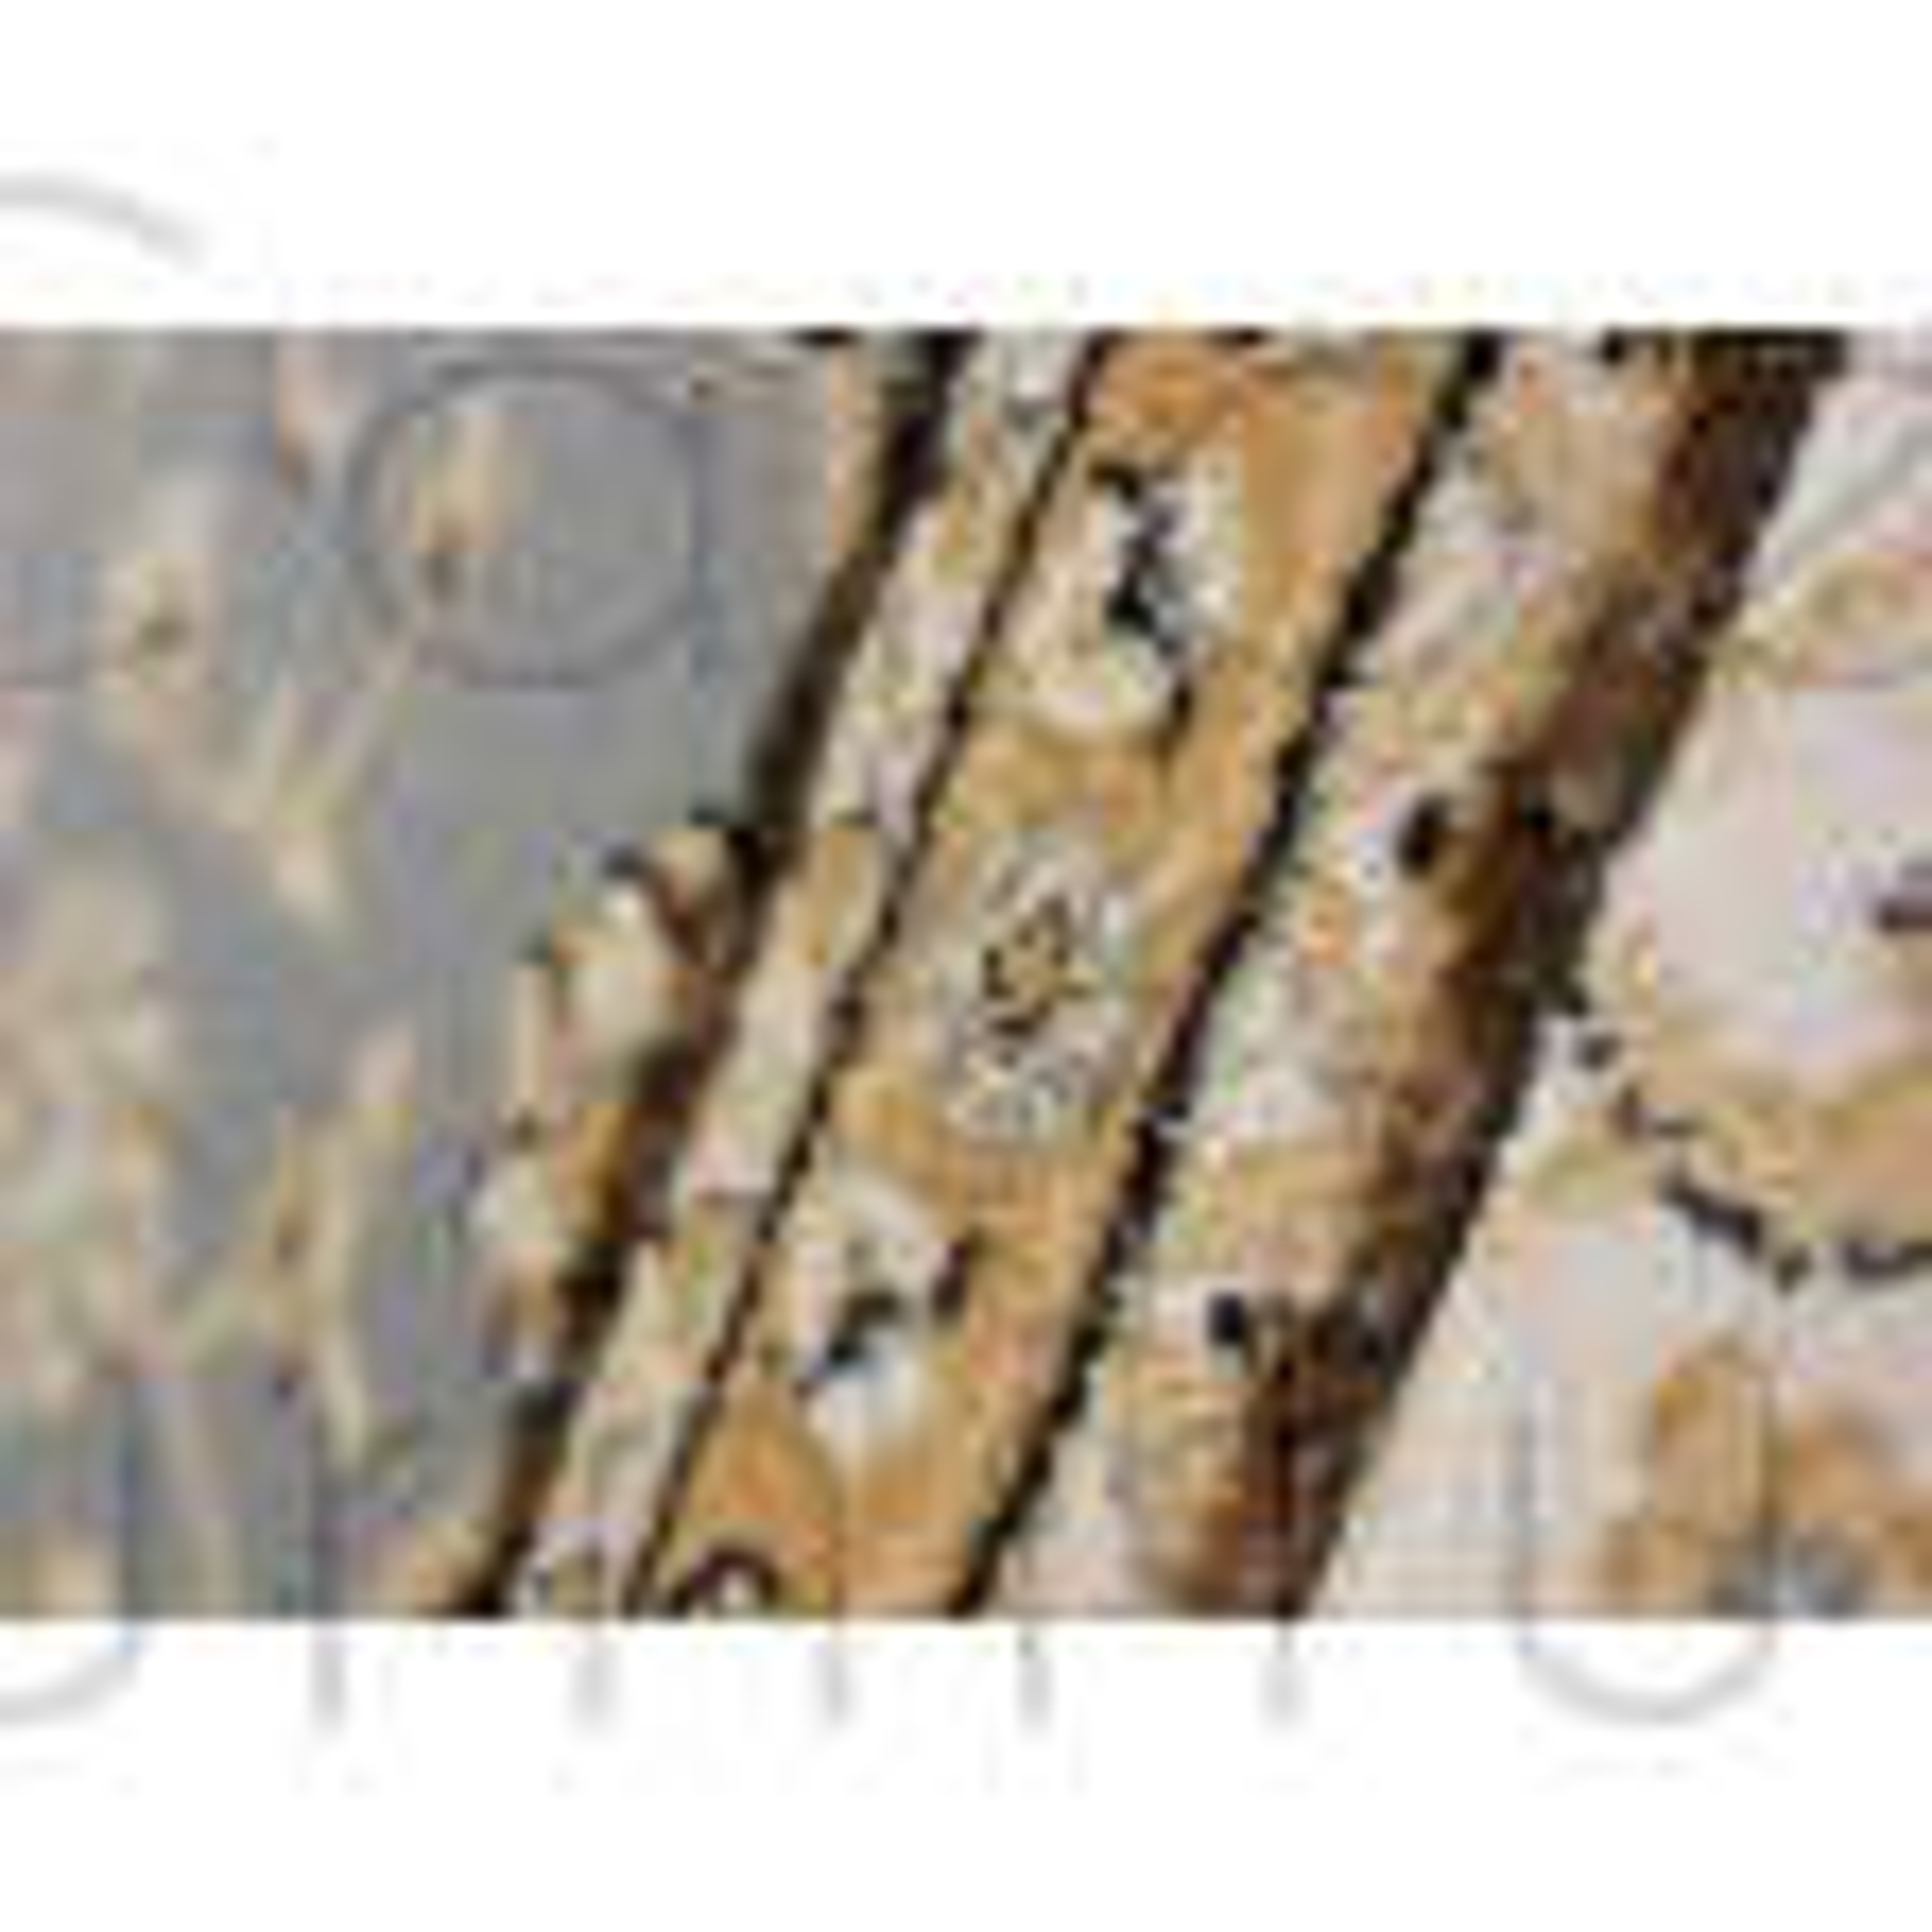 Ottoman Temple Rug - Grey - Size Runner 60 x 230 cm